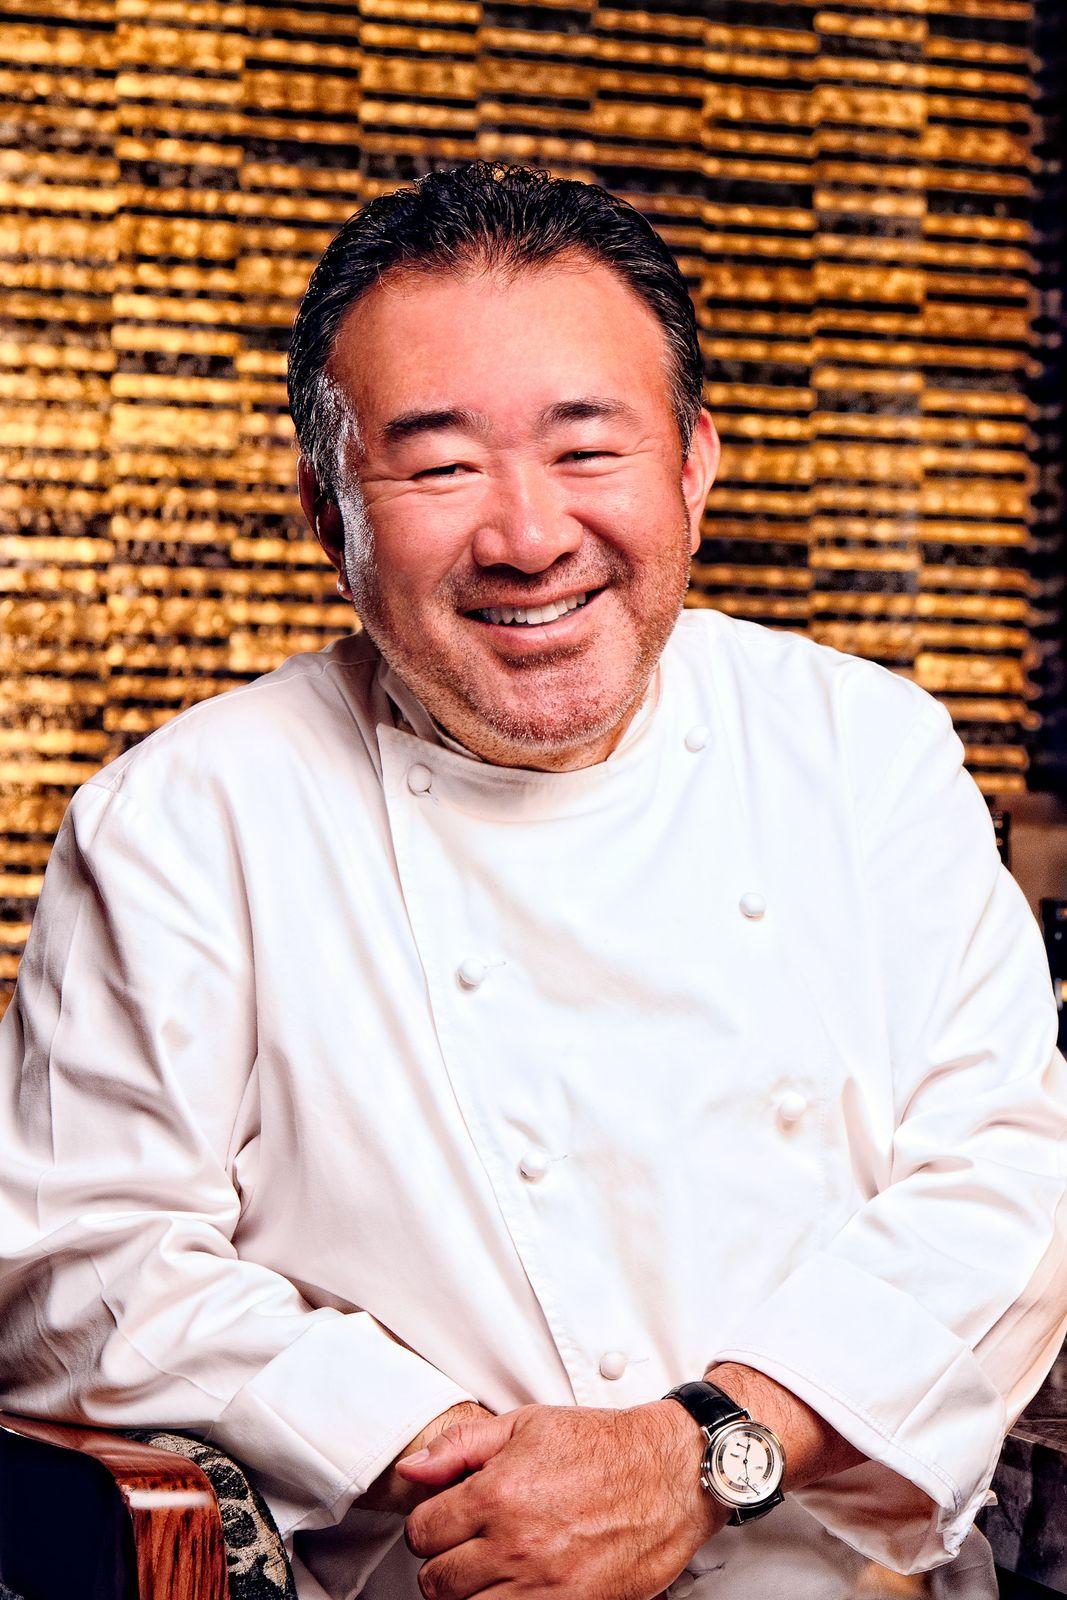 Chef Tetsuya Wakuda